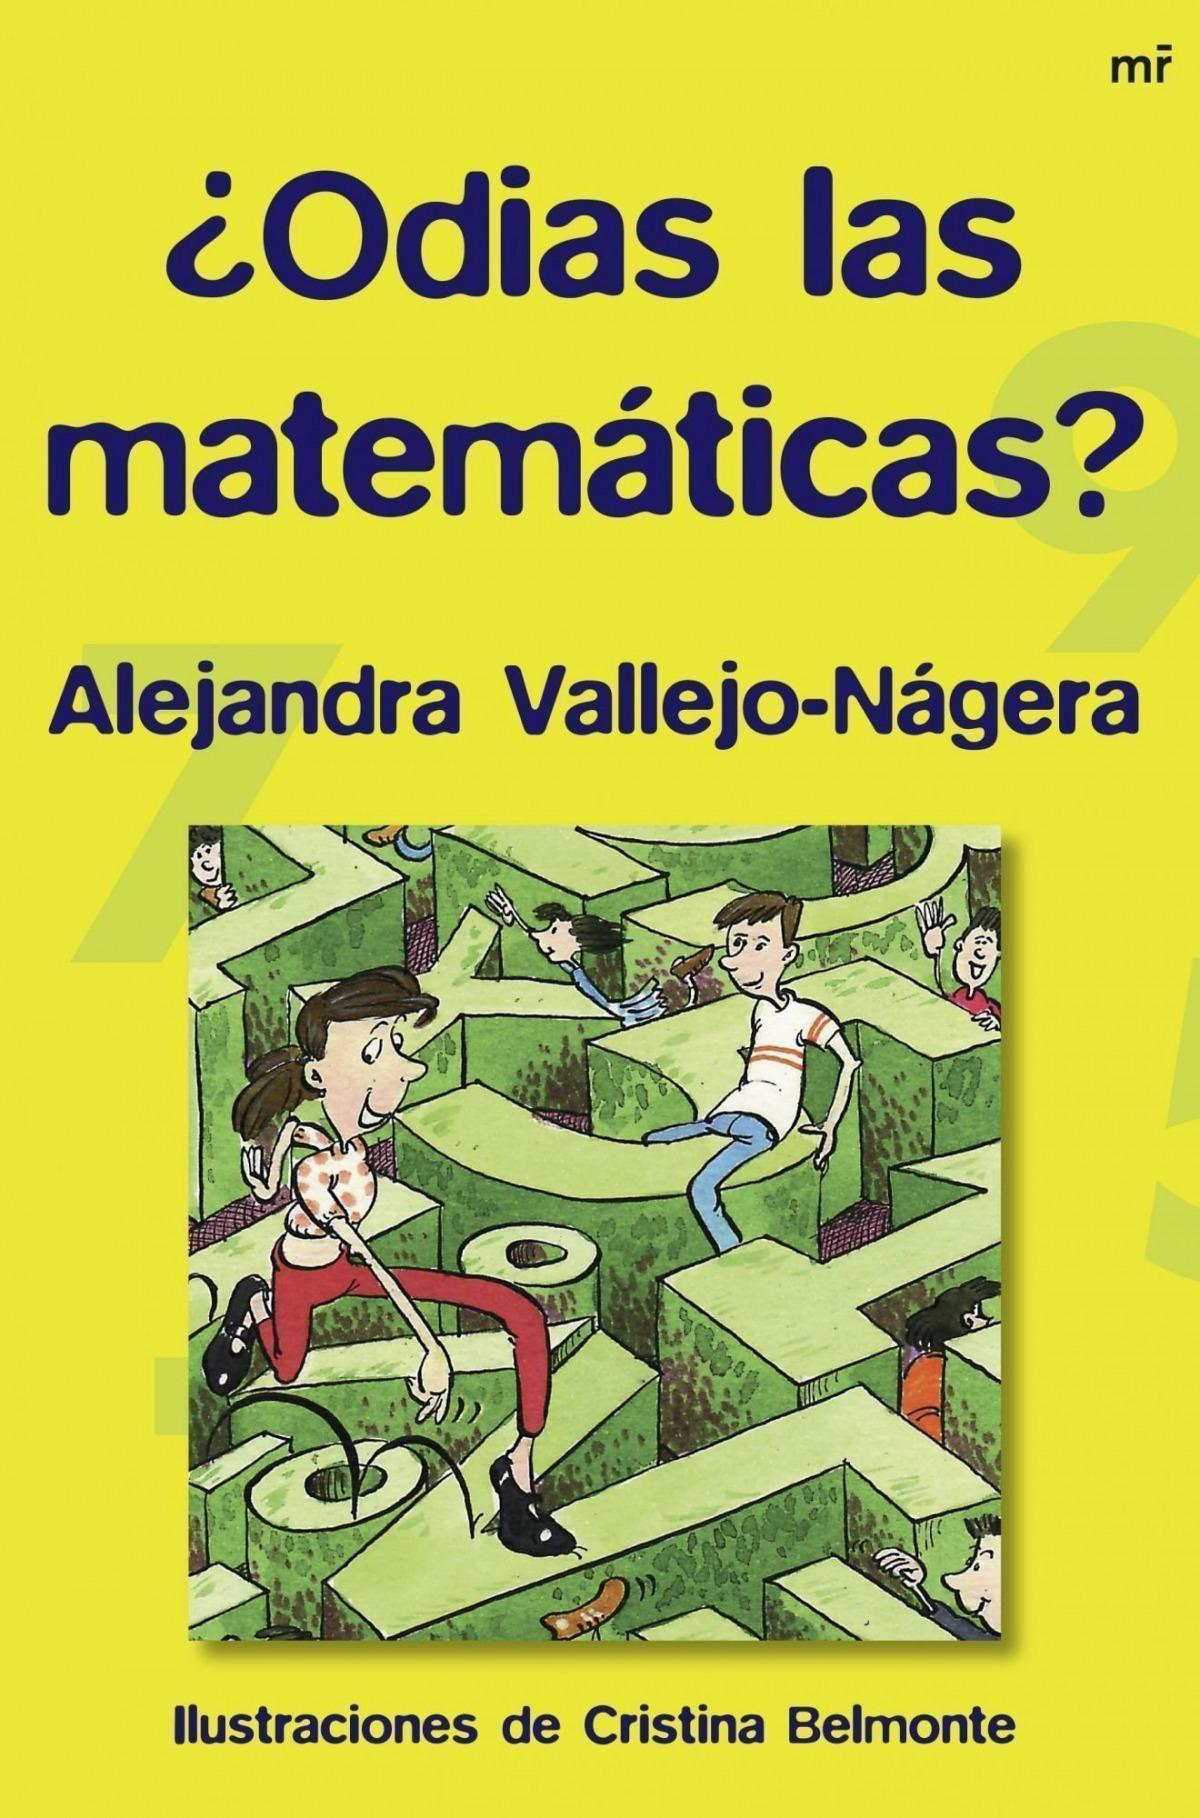 Odias las matemáticas? - Alejandra Vallejo-Nágera